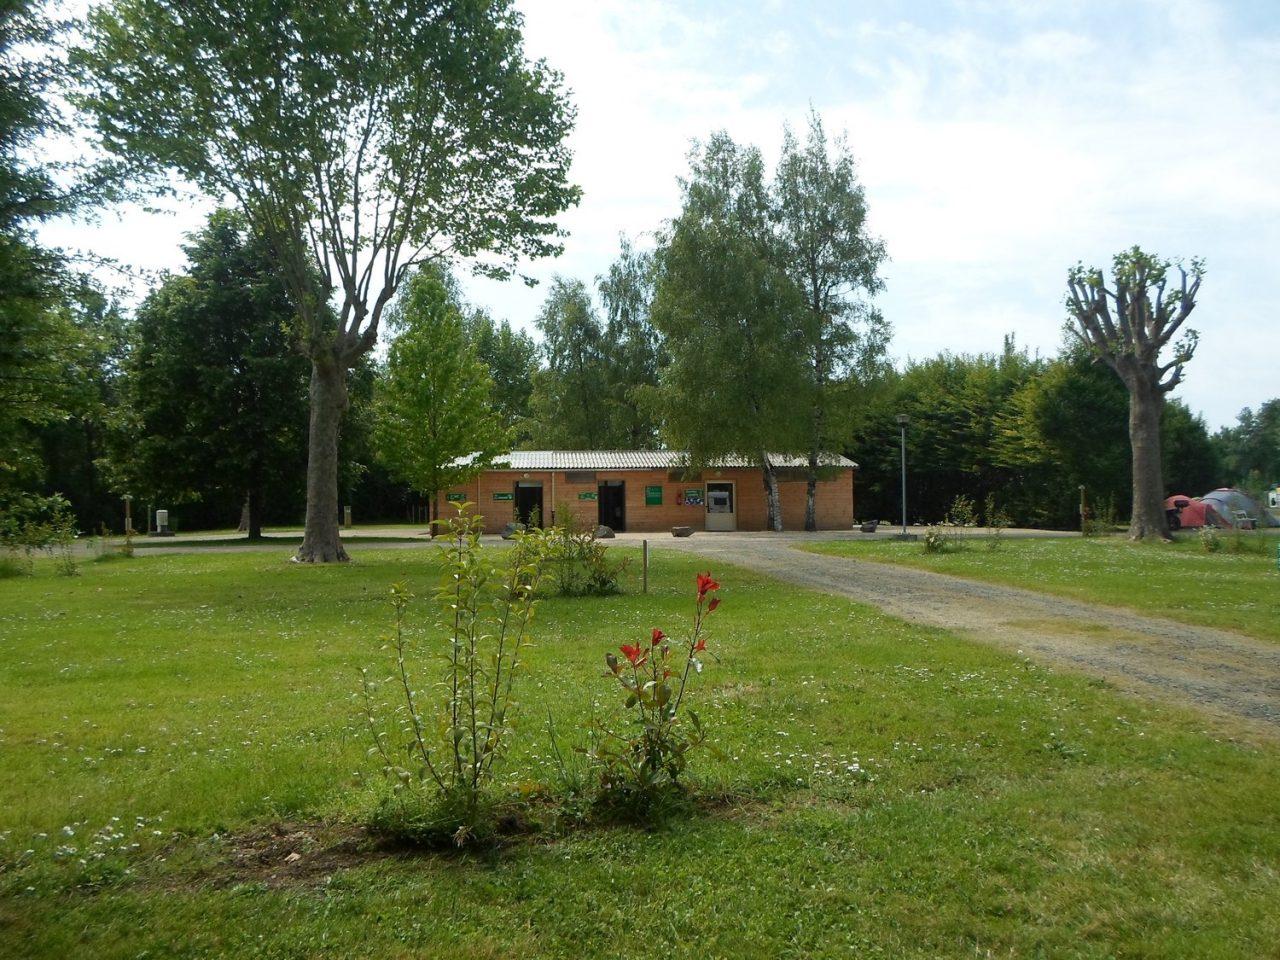 Frankrijk-Camping-Le-Martin-Pecheur-kinderen